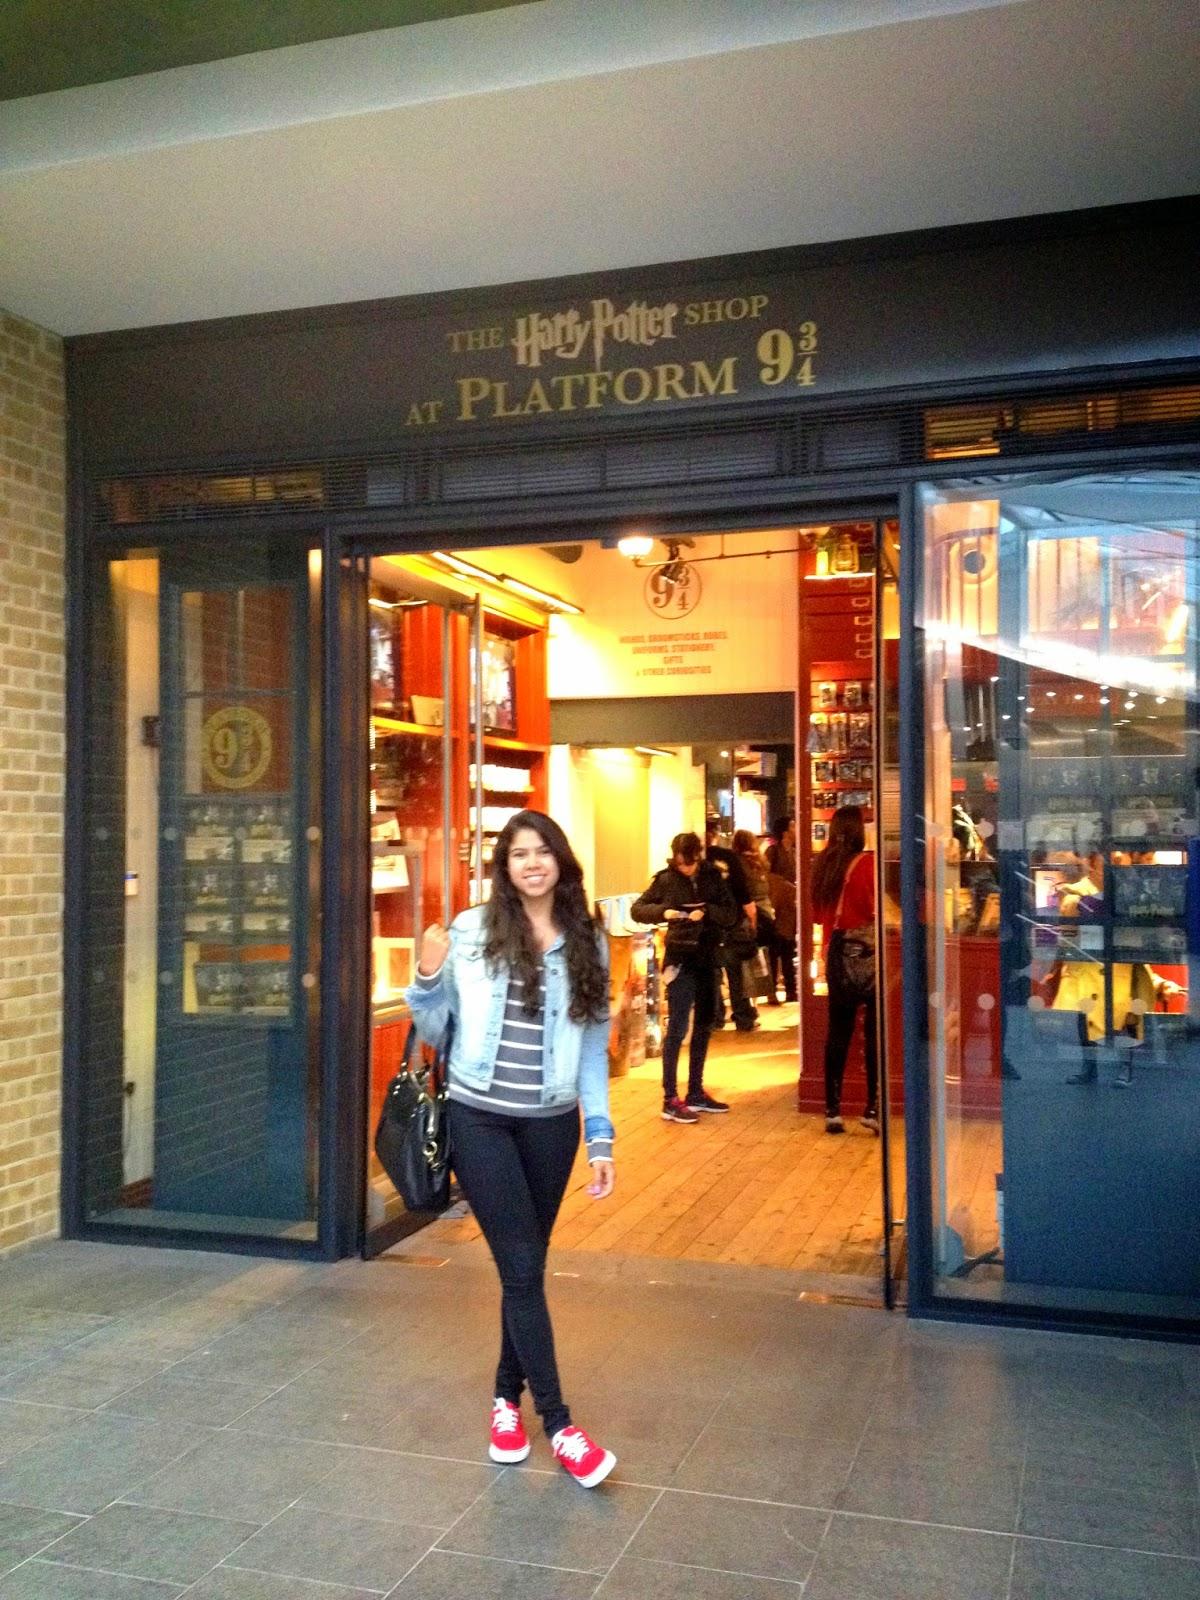 letmecrossover_london_eye_harrypotter_covent_garden_travel_guide_united_kingdon_michele_mattos_primark